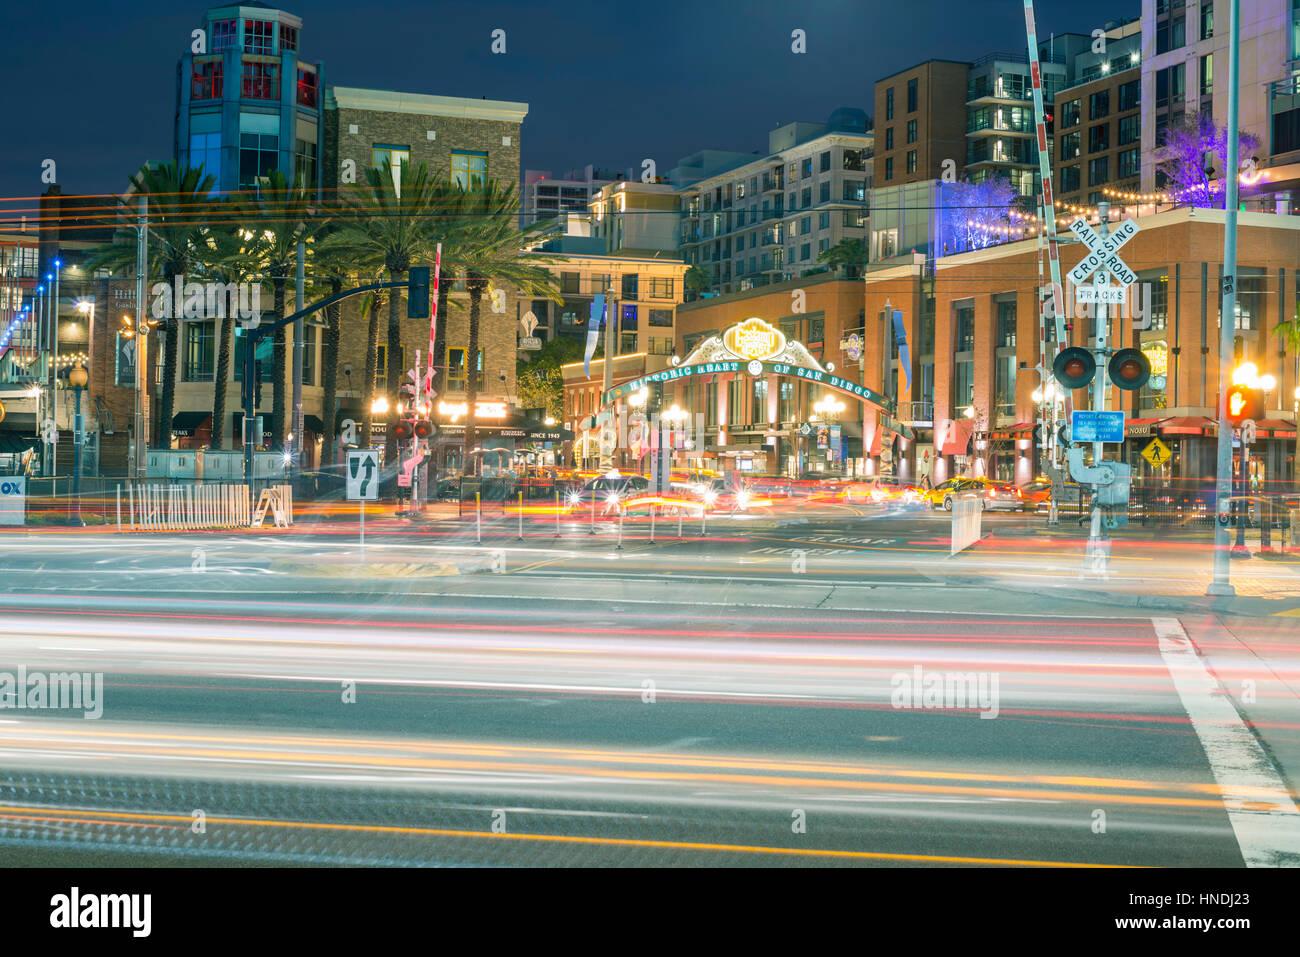 Gaslamp Quarter neon sign.  Downtown San Diego, California, USA. - Stock Image